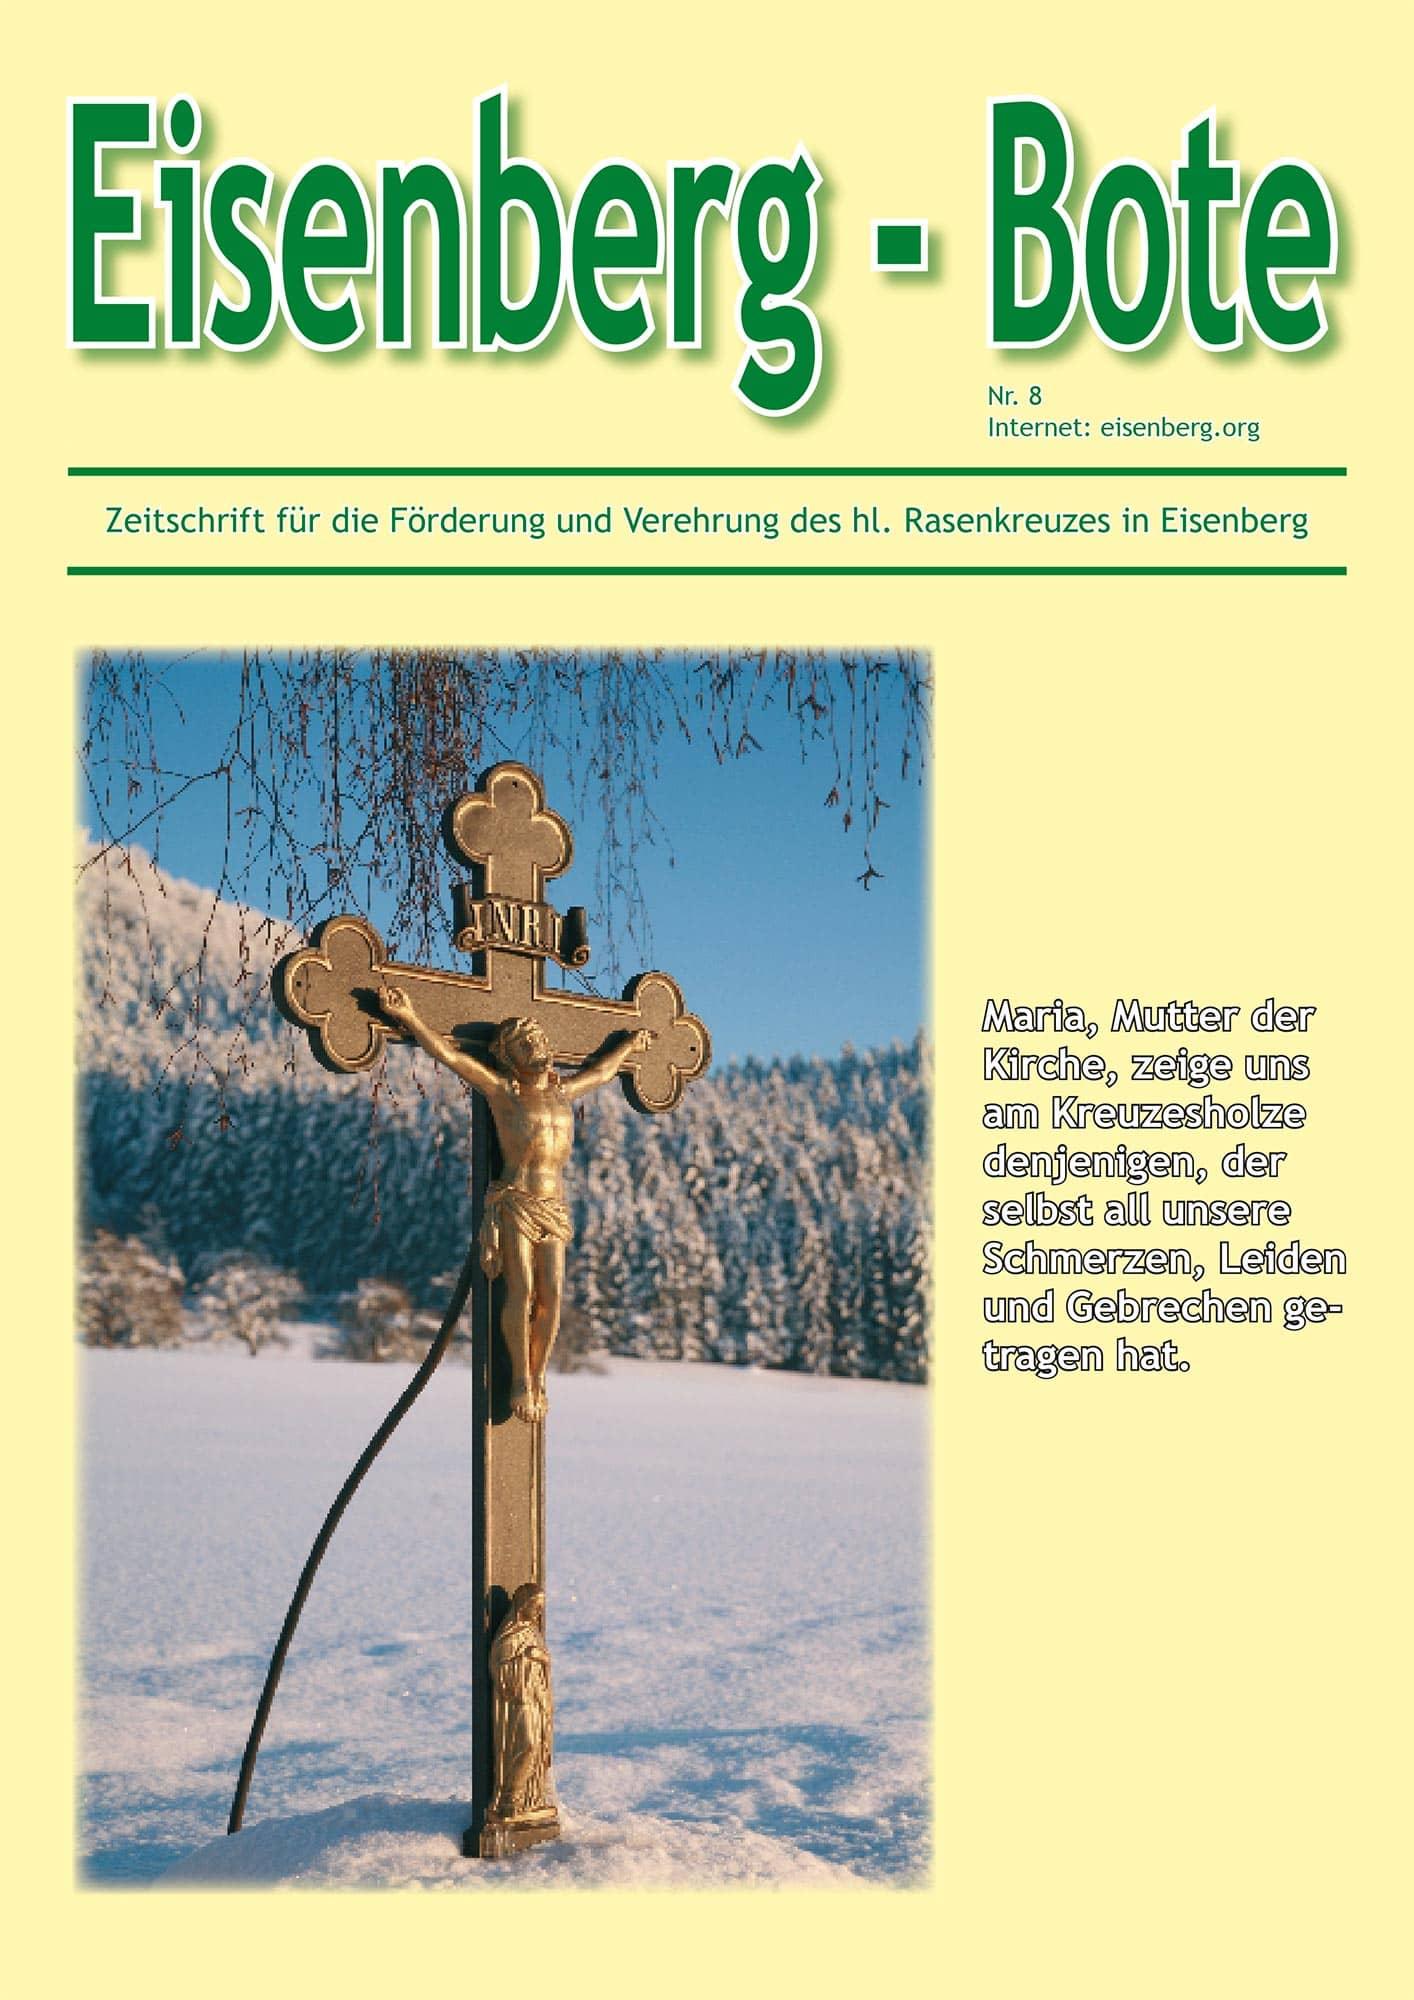 Eisenberg_Bote_08